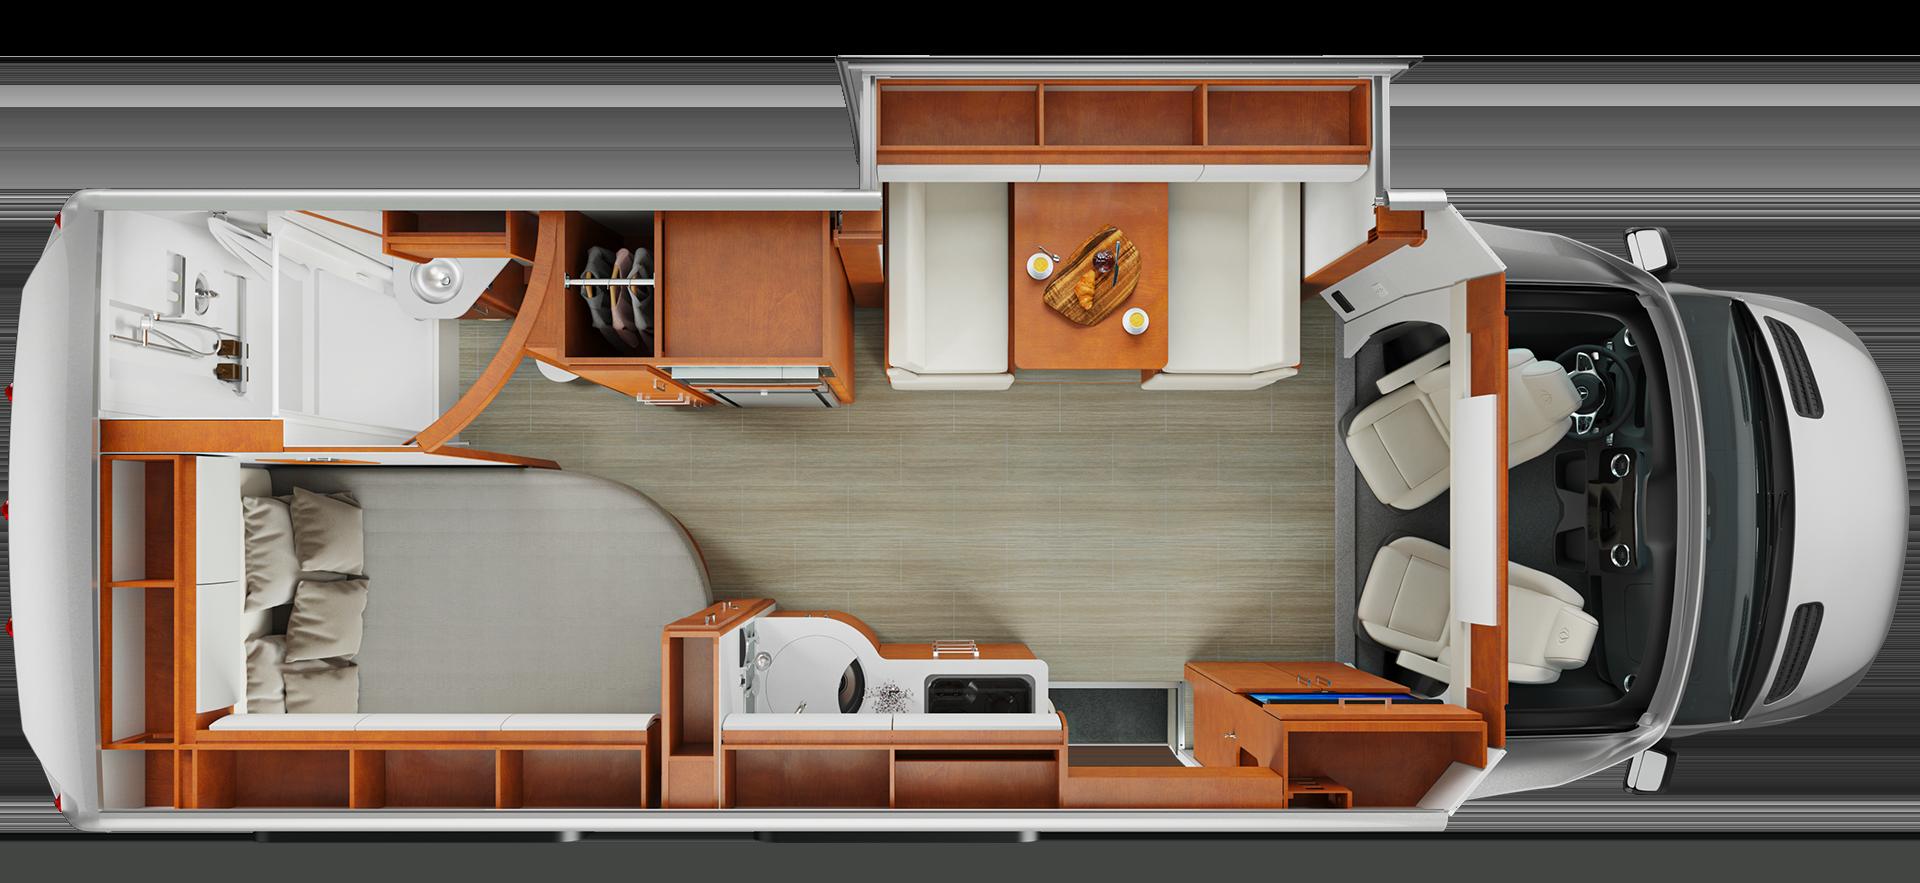 Unity CB Floorplan